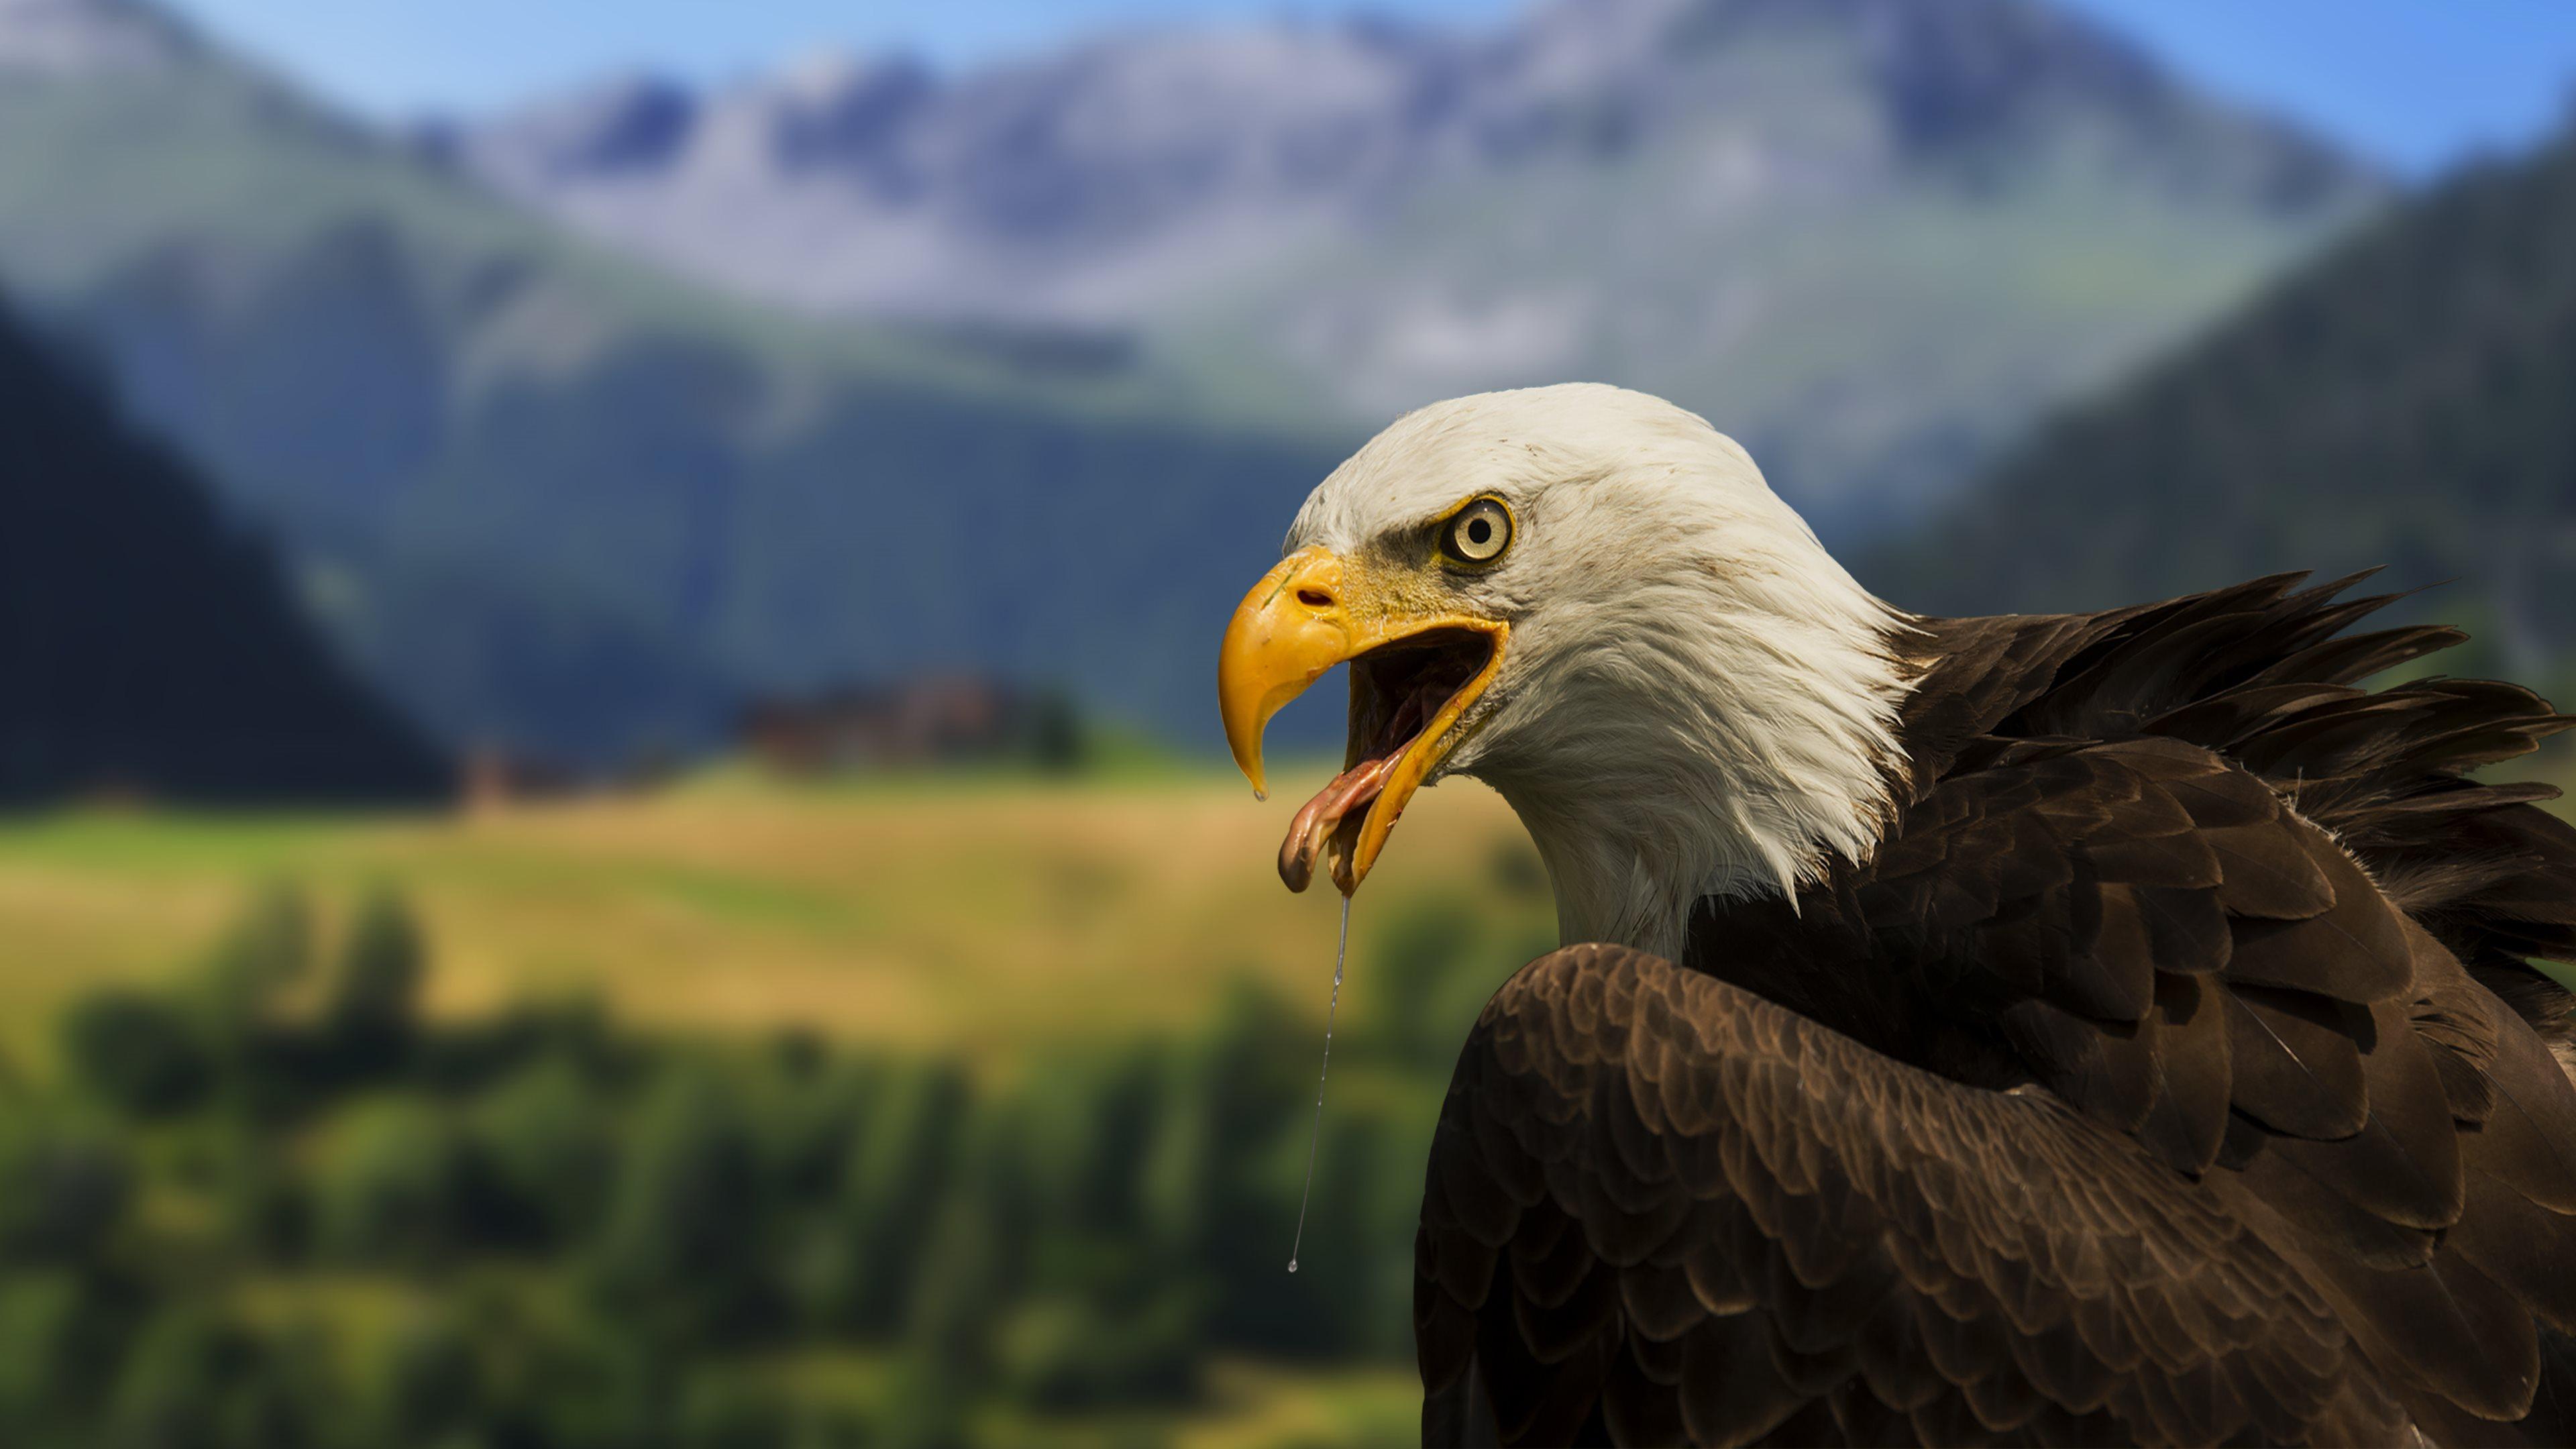 Beautiful Bald Eagle 4K Wallpaper Desktop Backgrounds 3840x2160